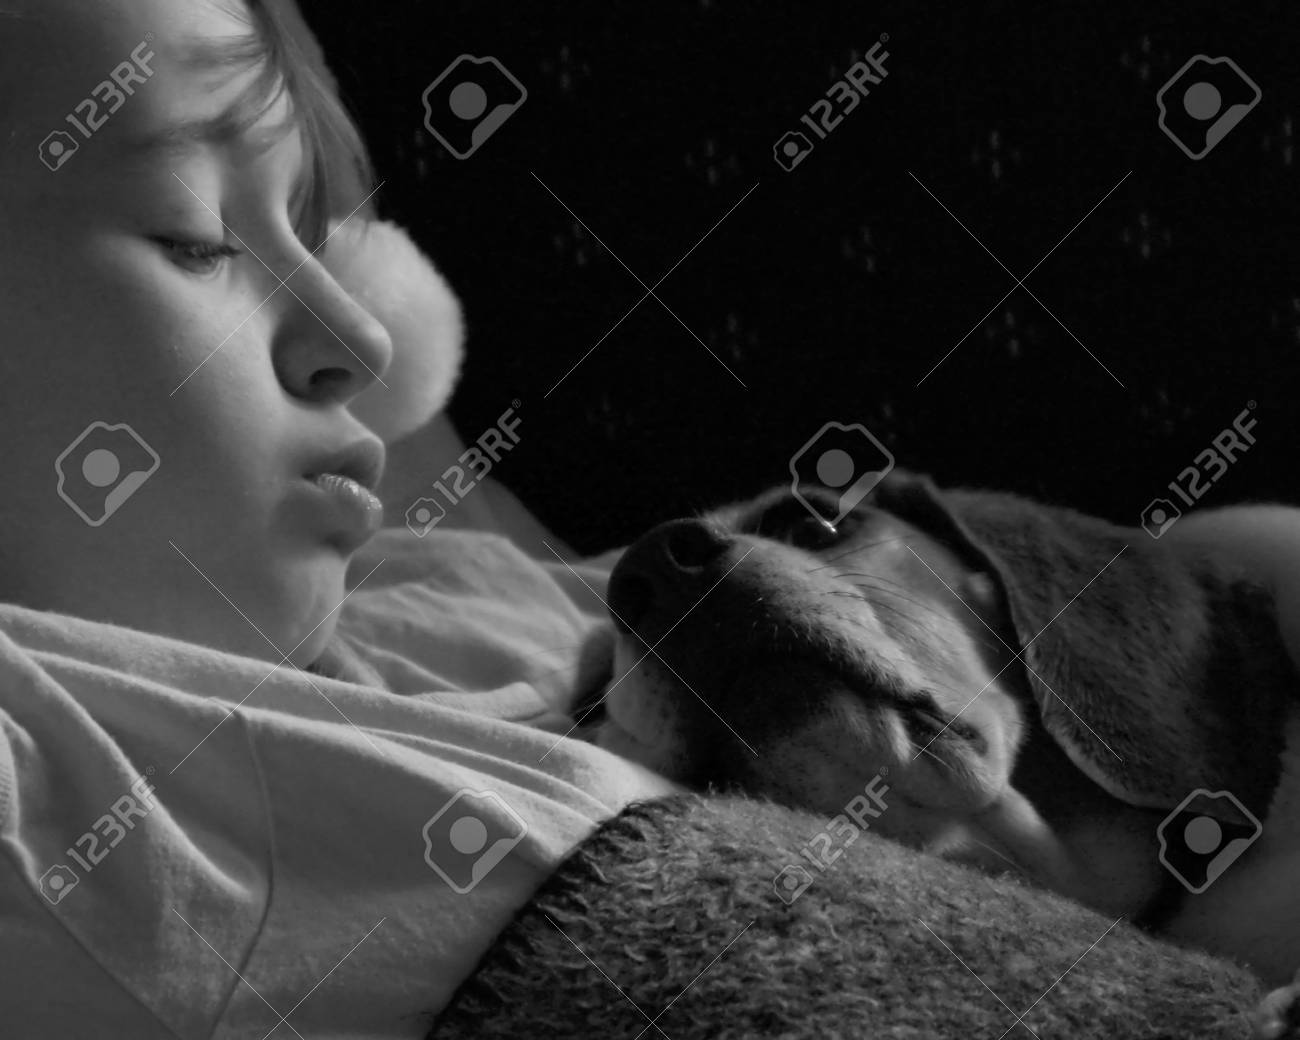 Loyality- Monochrome Photo of Child Sleeping with Pet Dog Stock Photo - 945203